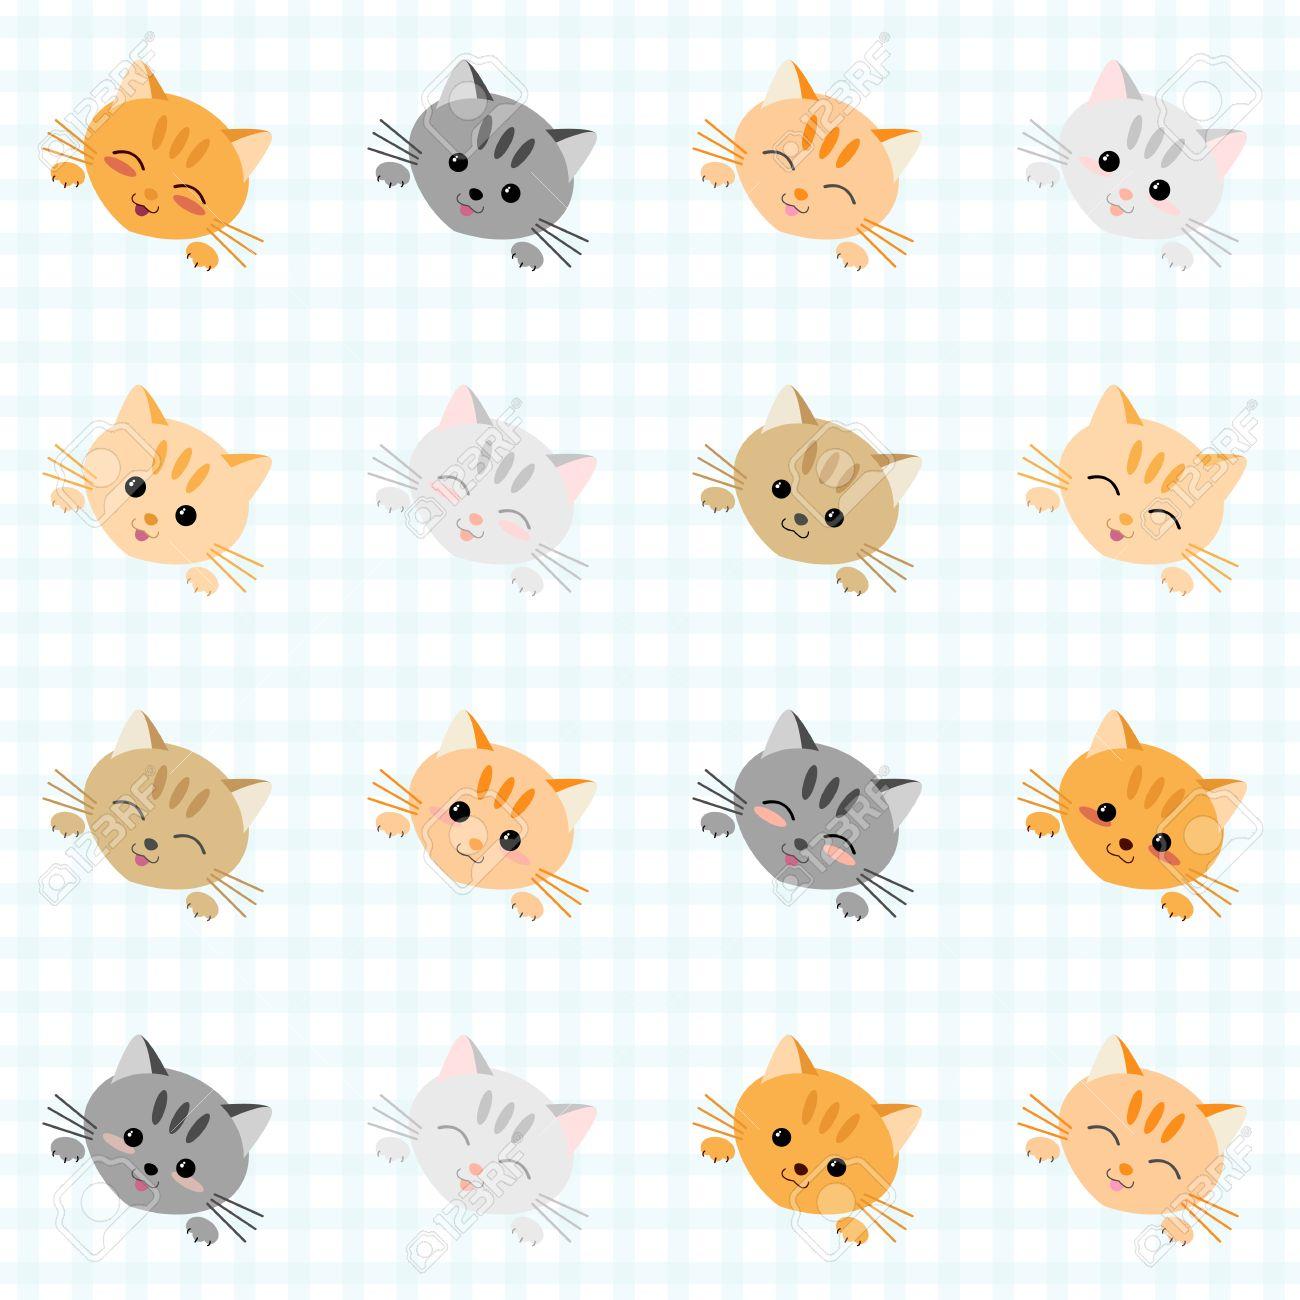 Seamless illustration with cute cats. Japanese manga style. Kawaii joyful cats. Kitten background